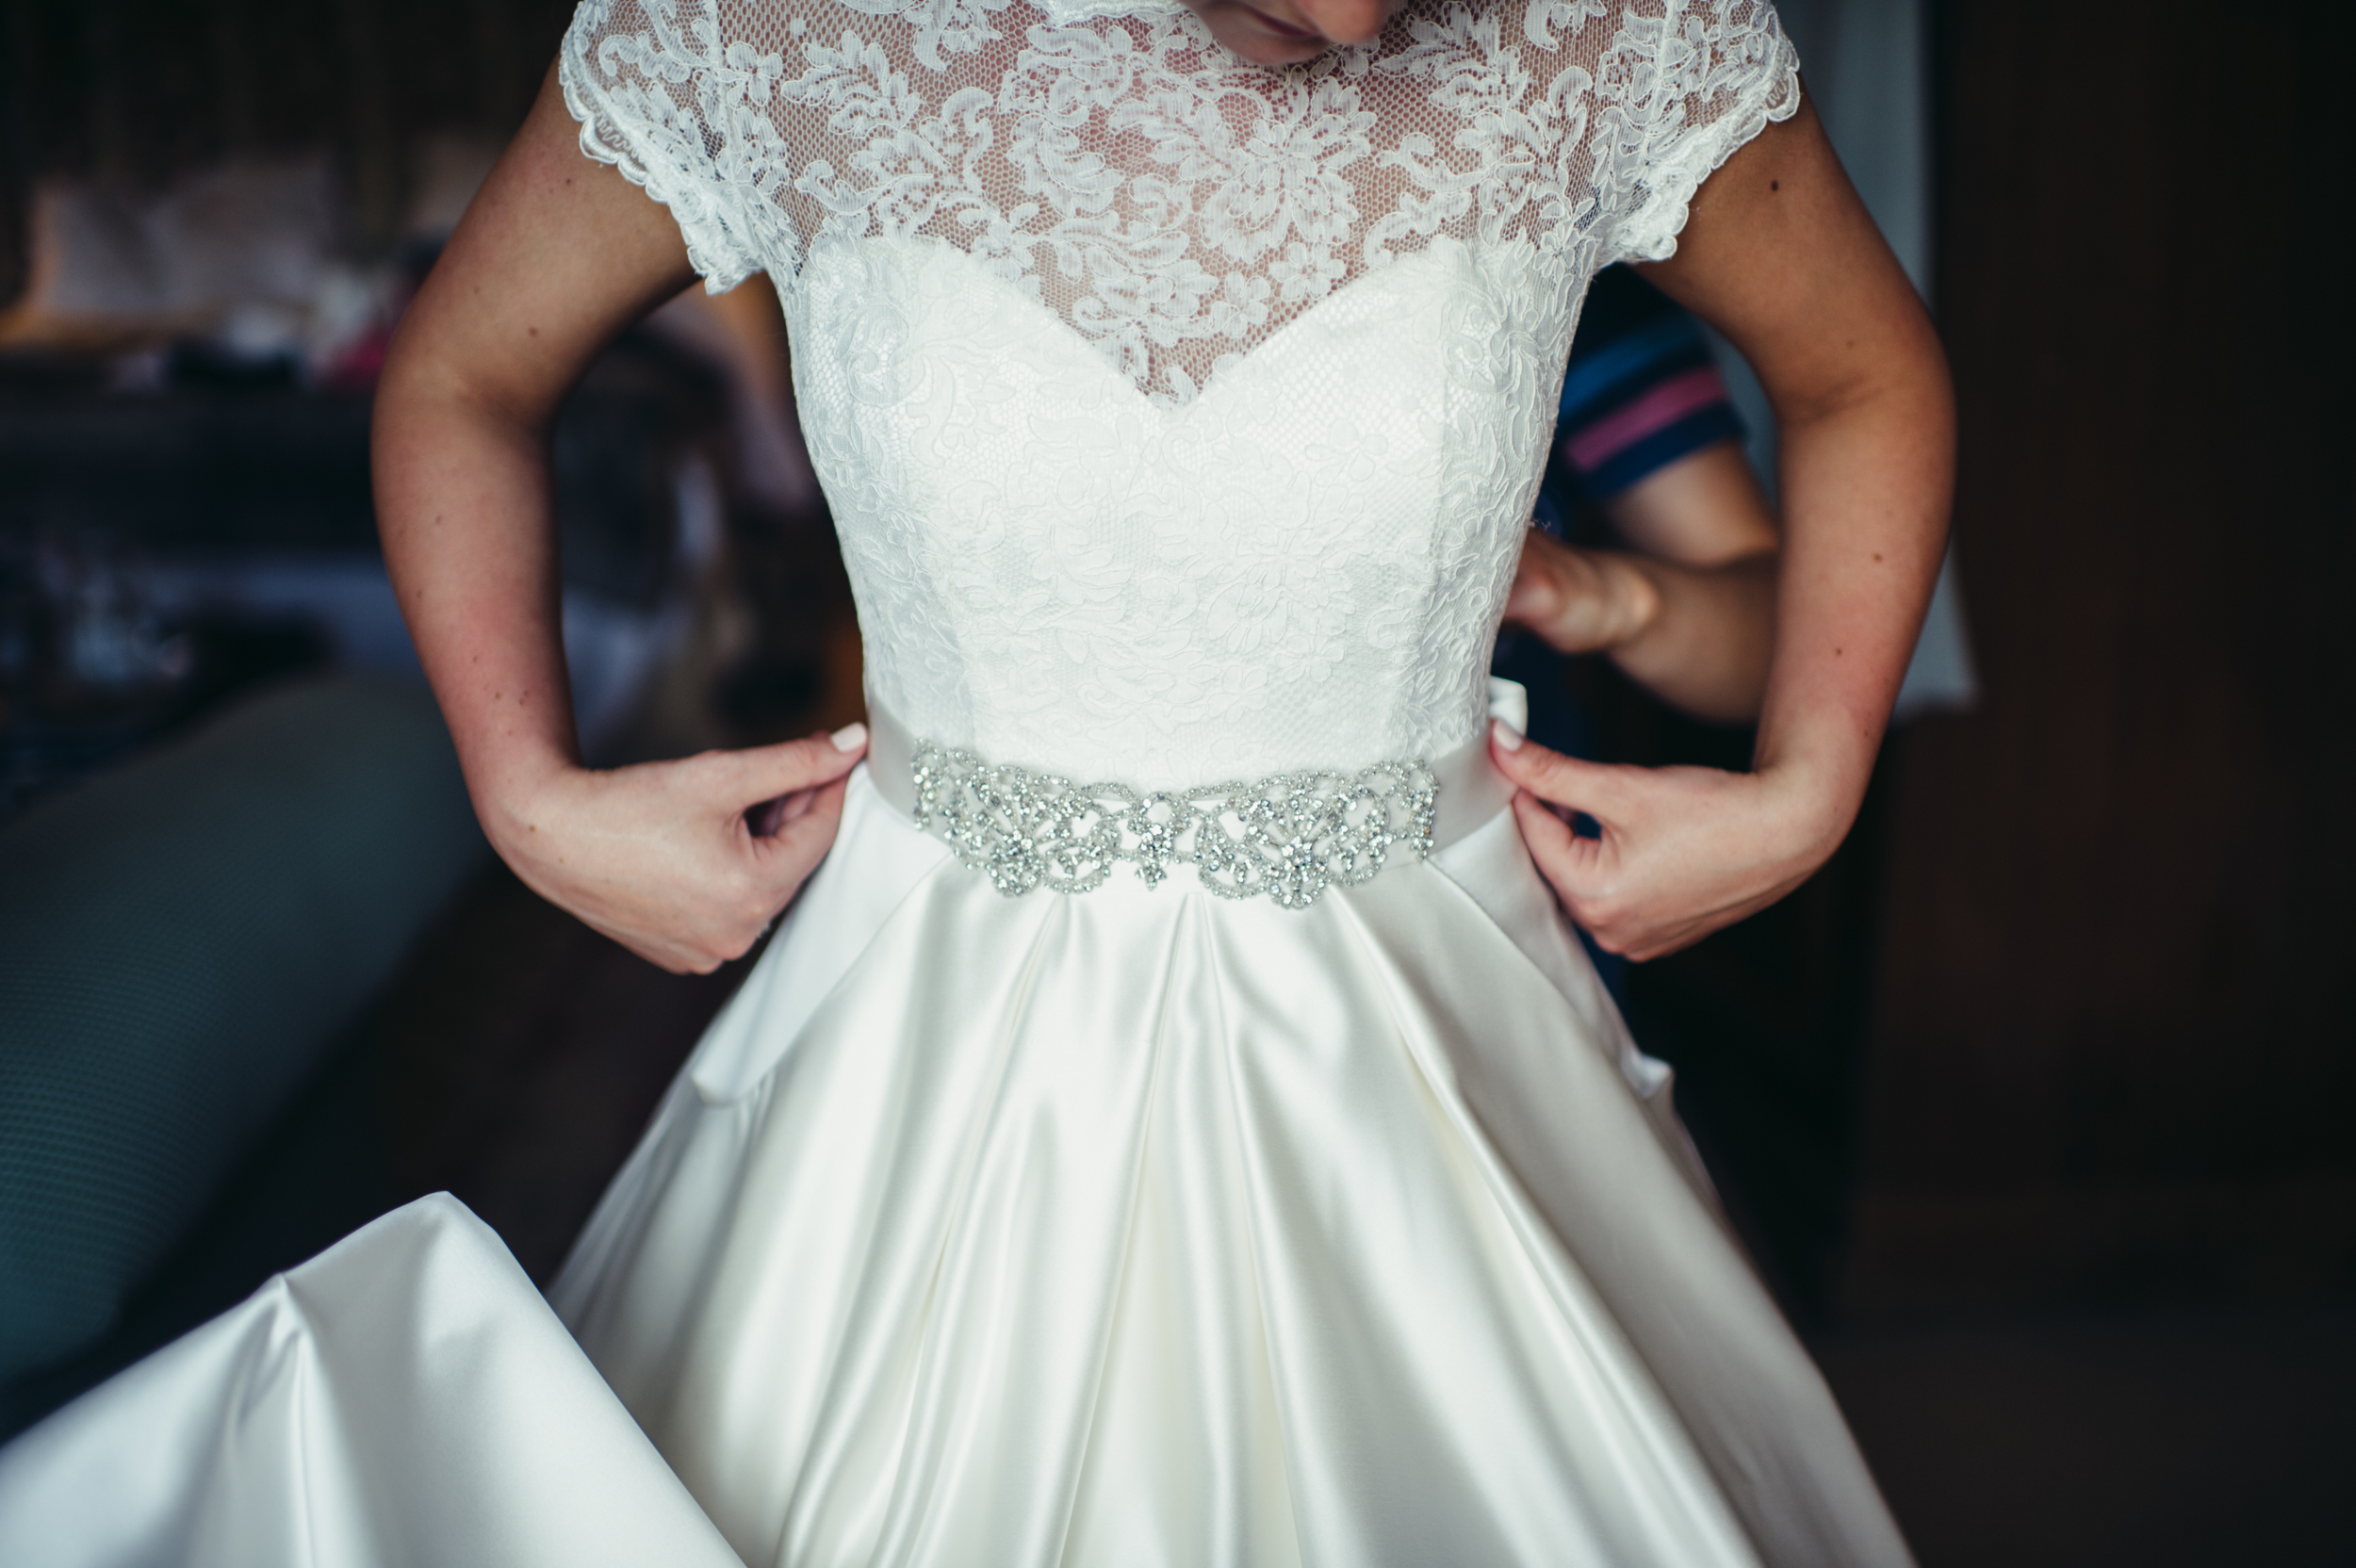 0067-lisa-devine-alternative-creative-wedding-photography-glasgow-edinburgh.JPG